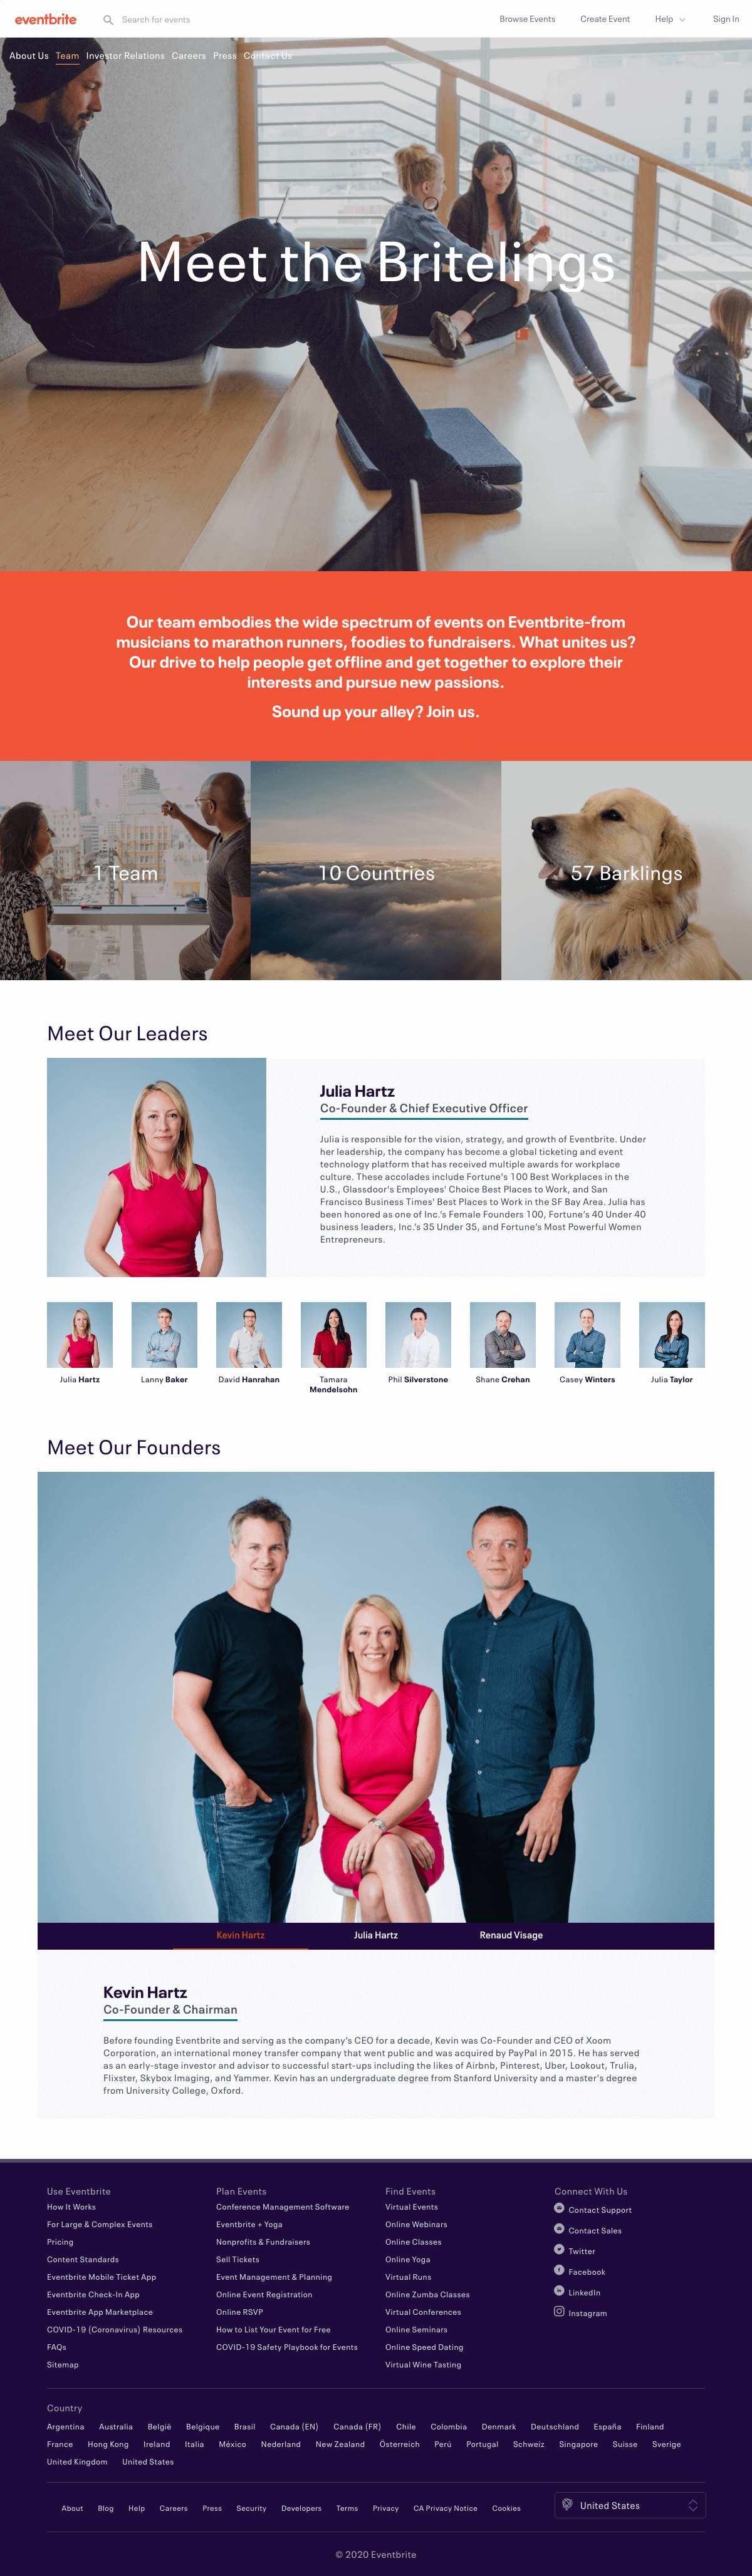 Eventbrite – Team page